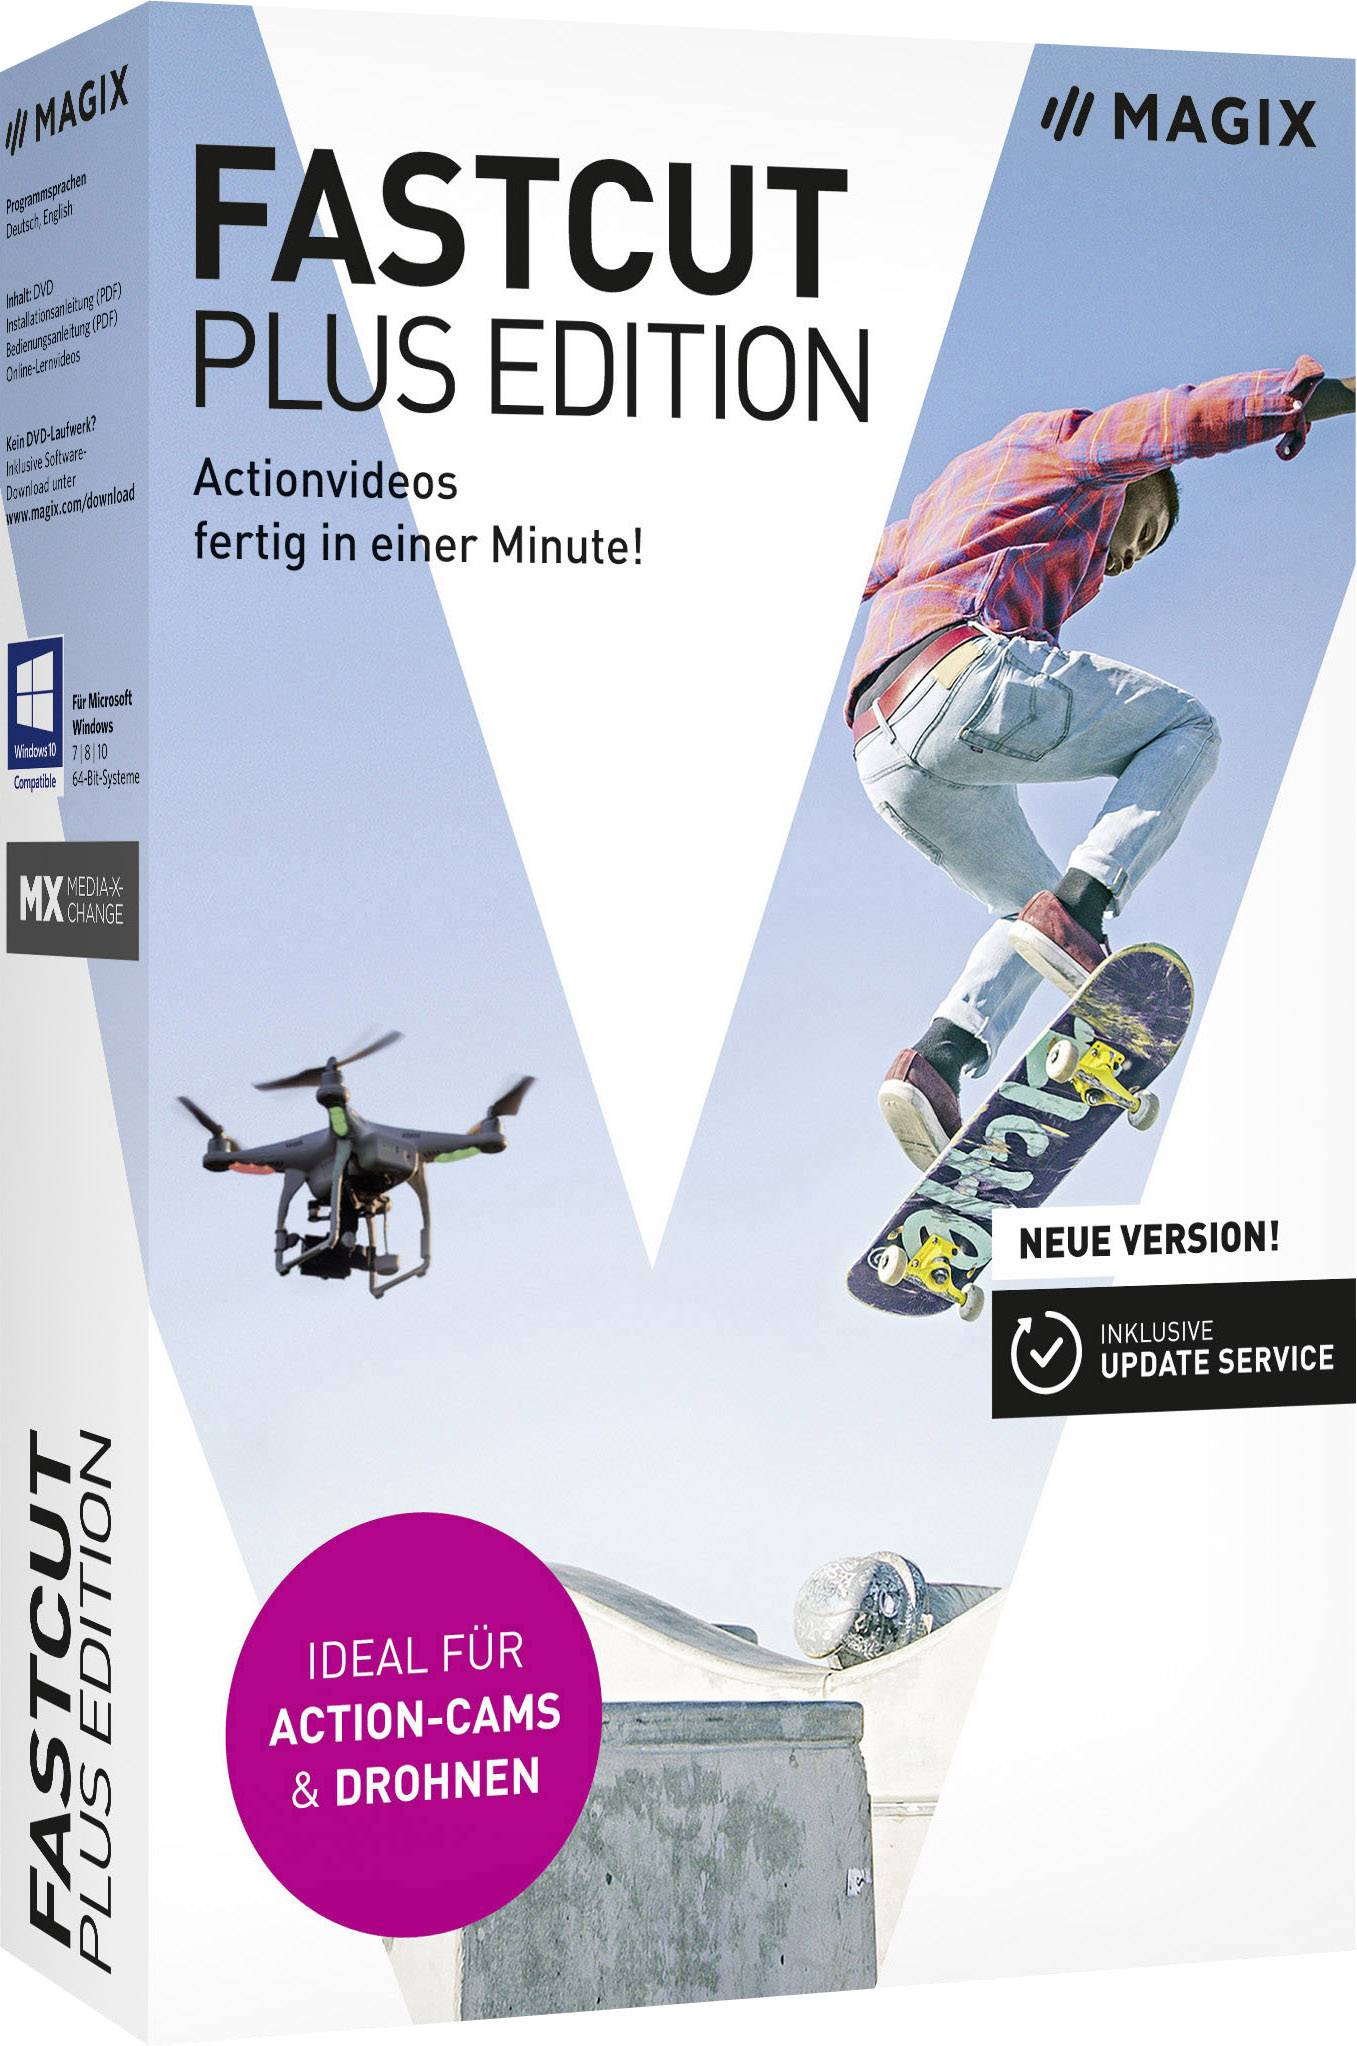 Magix Fastcut Full version, 1 license Windows Video editor